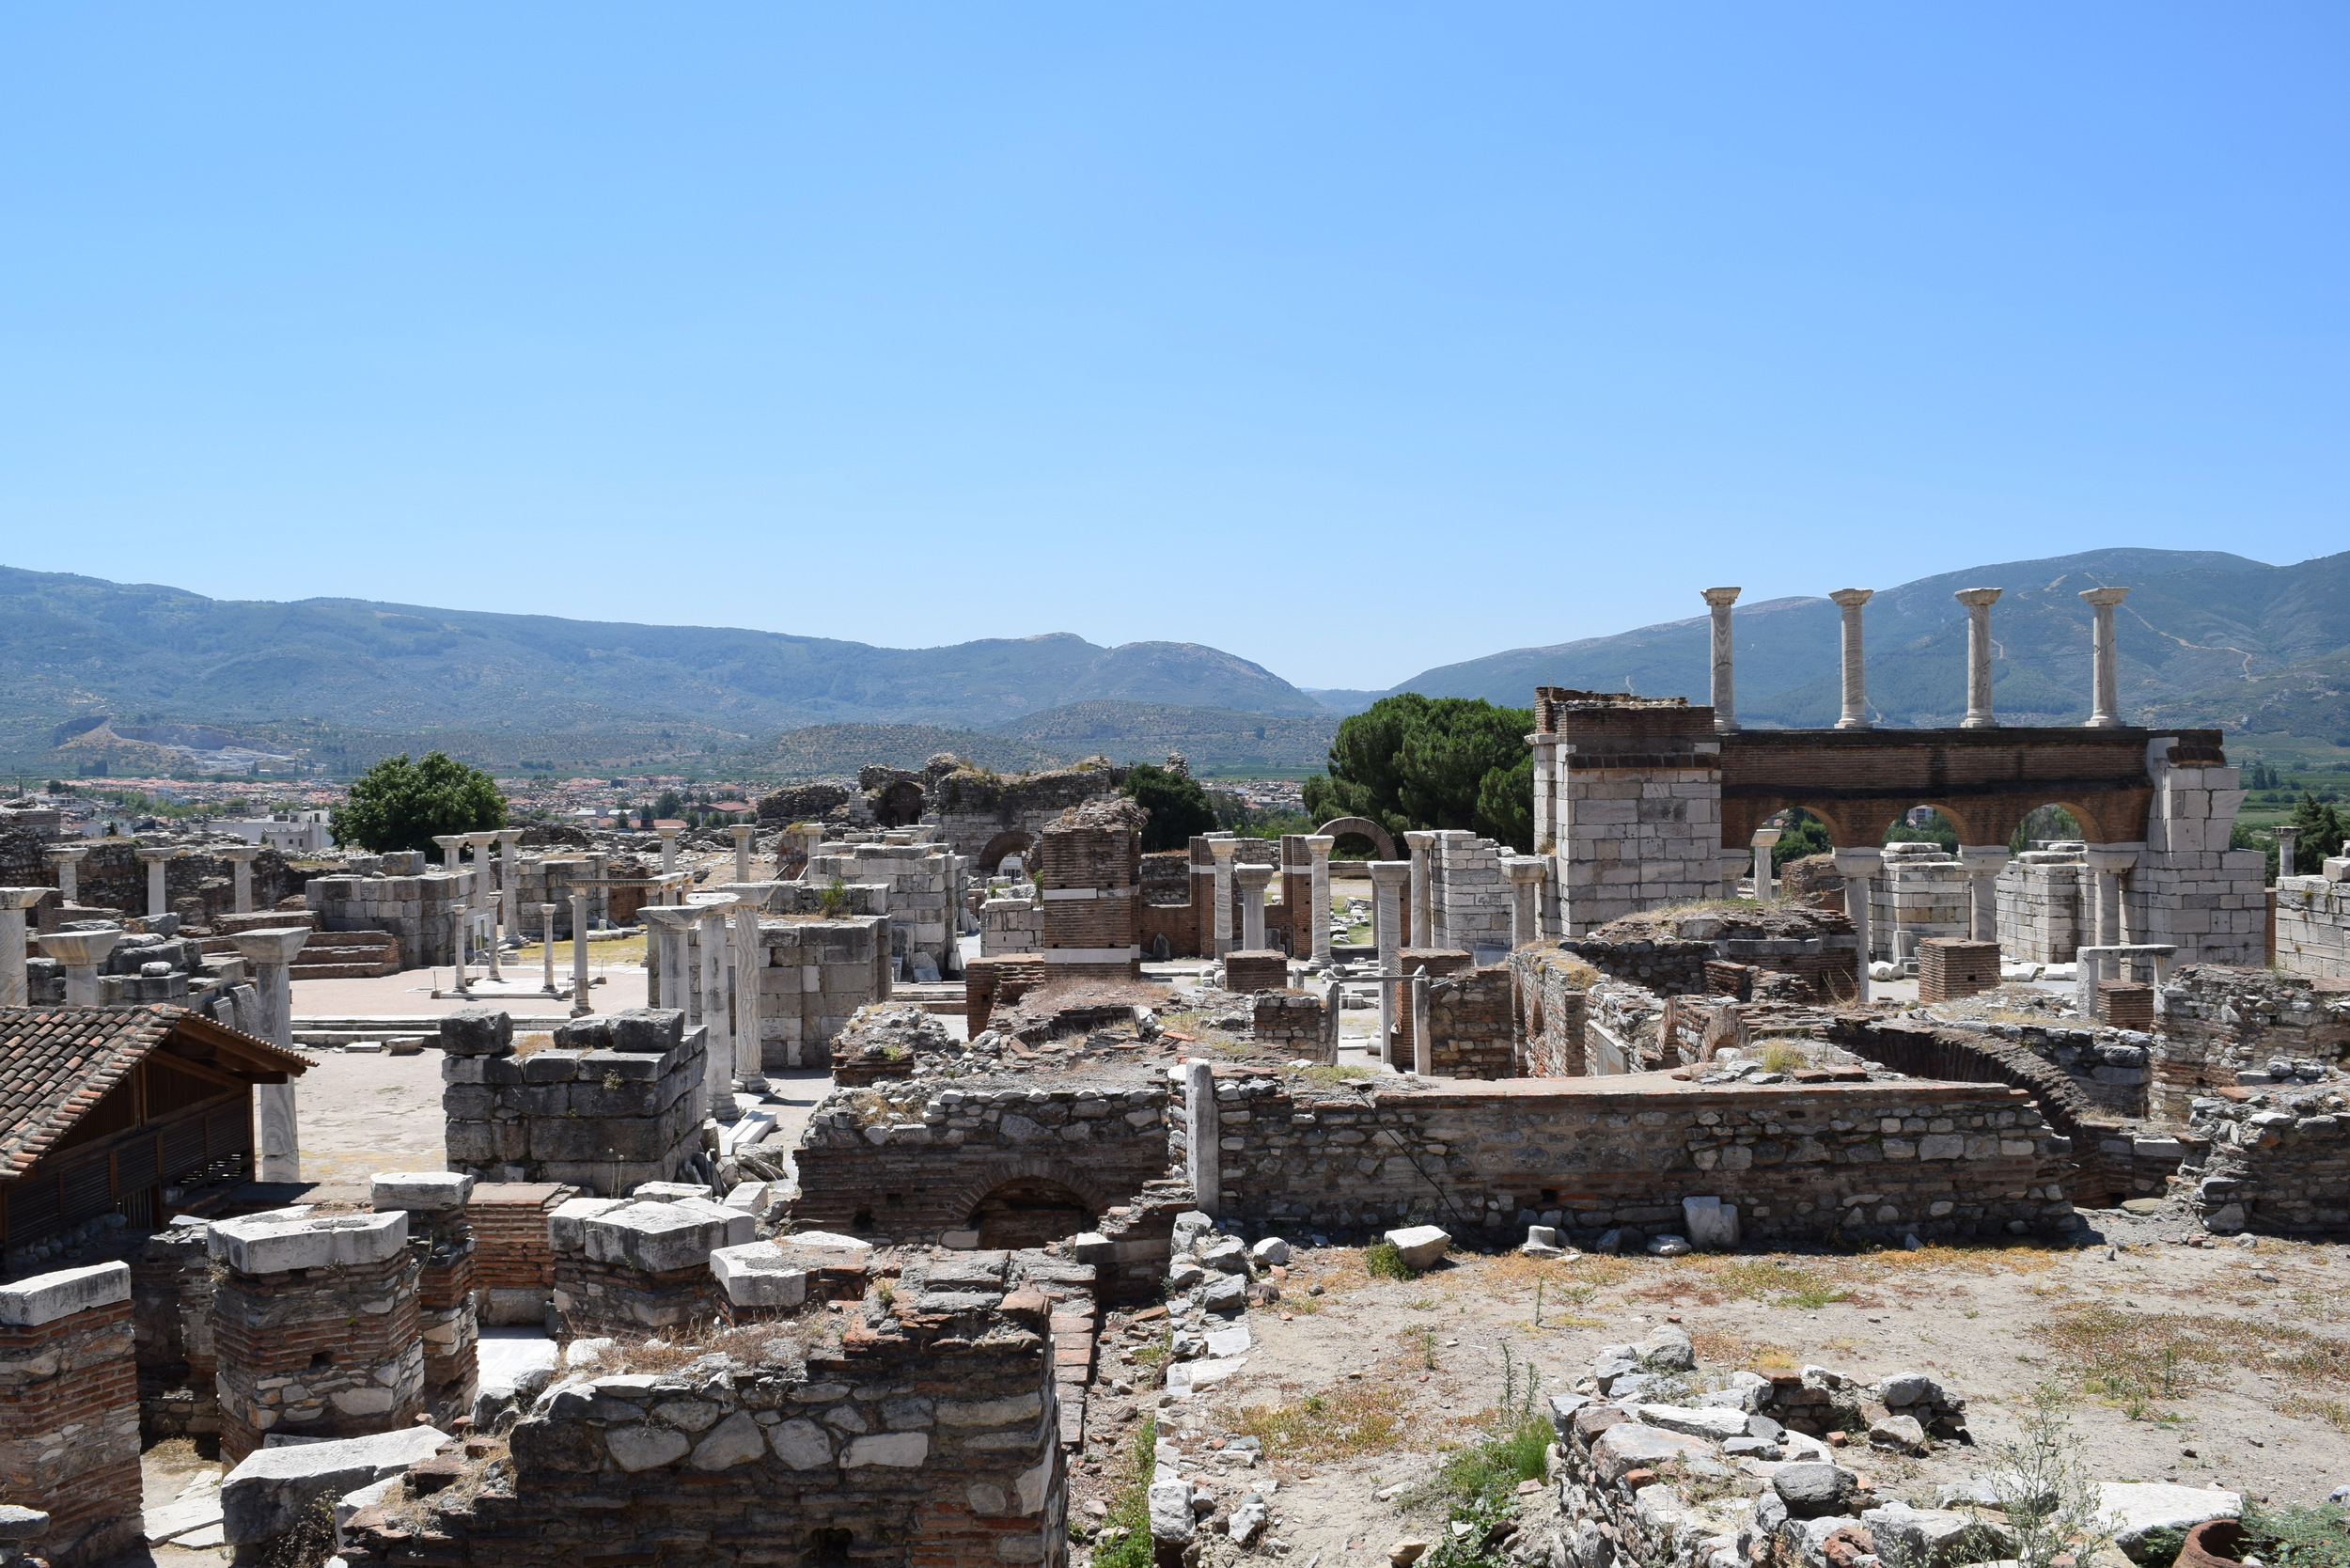 Ruins of the Basilica of St. John